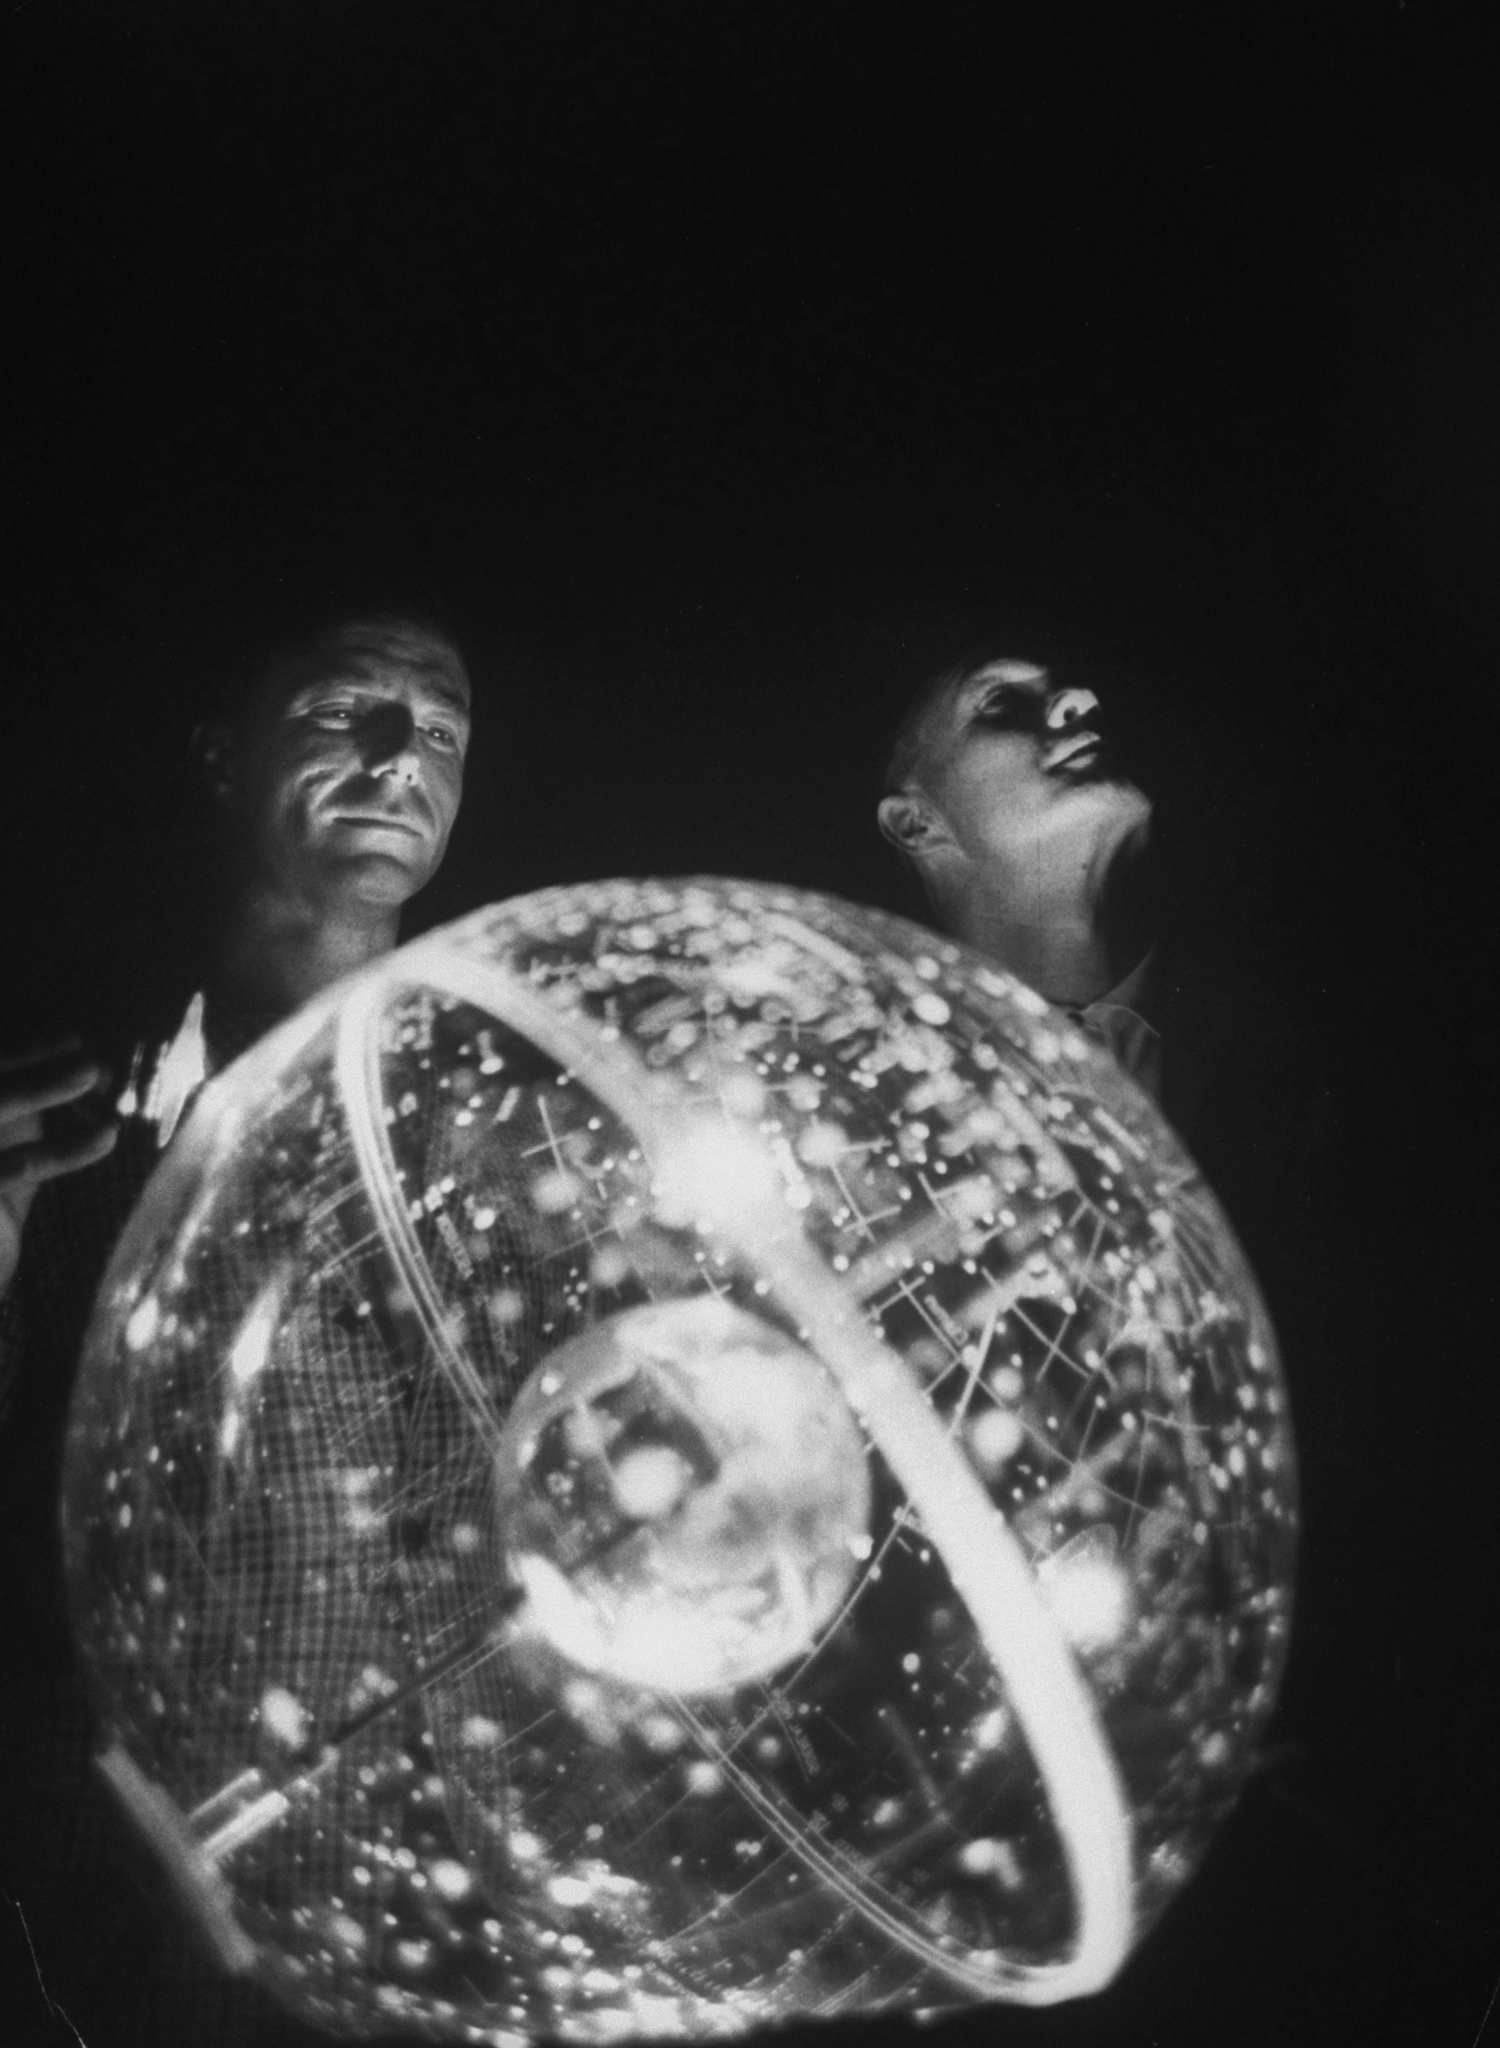 Celestial Ambitions Scott Carpenter, left, and Glenn study the three-dimensional celestial trainer in 1961.